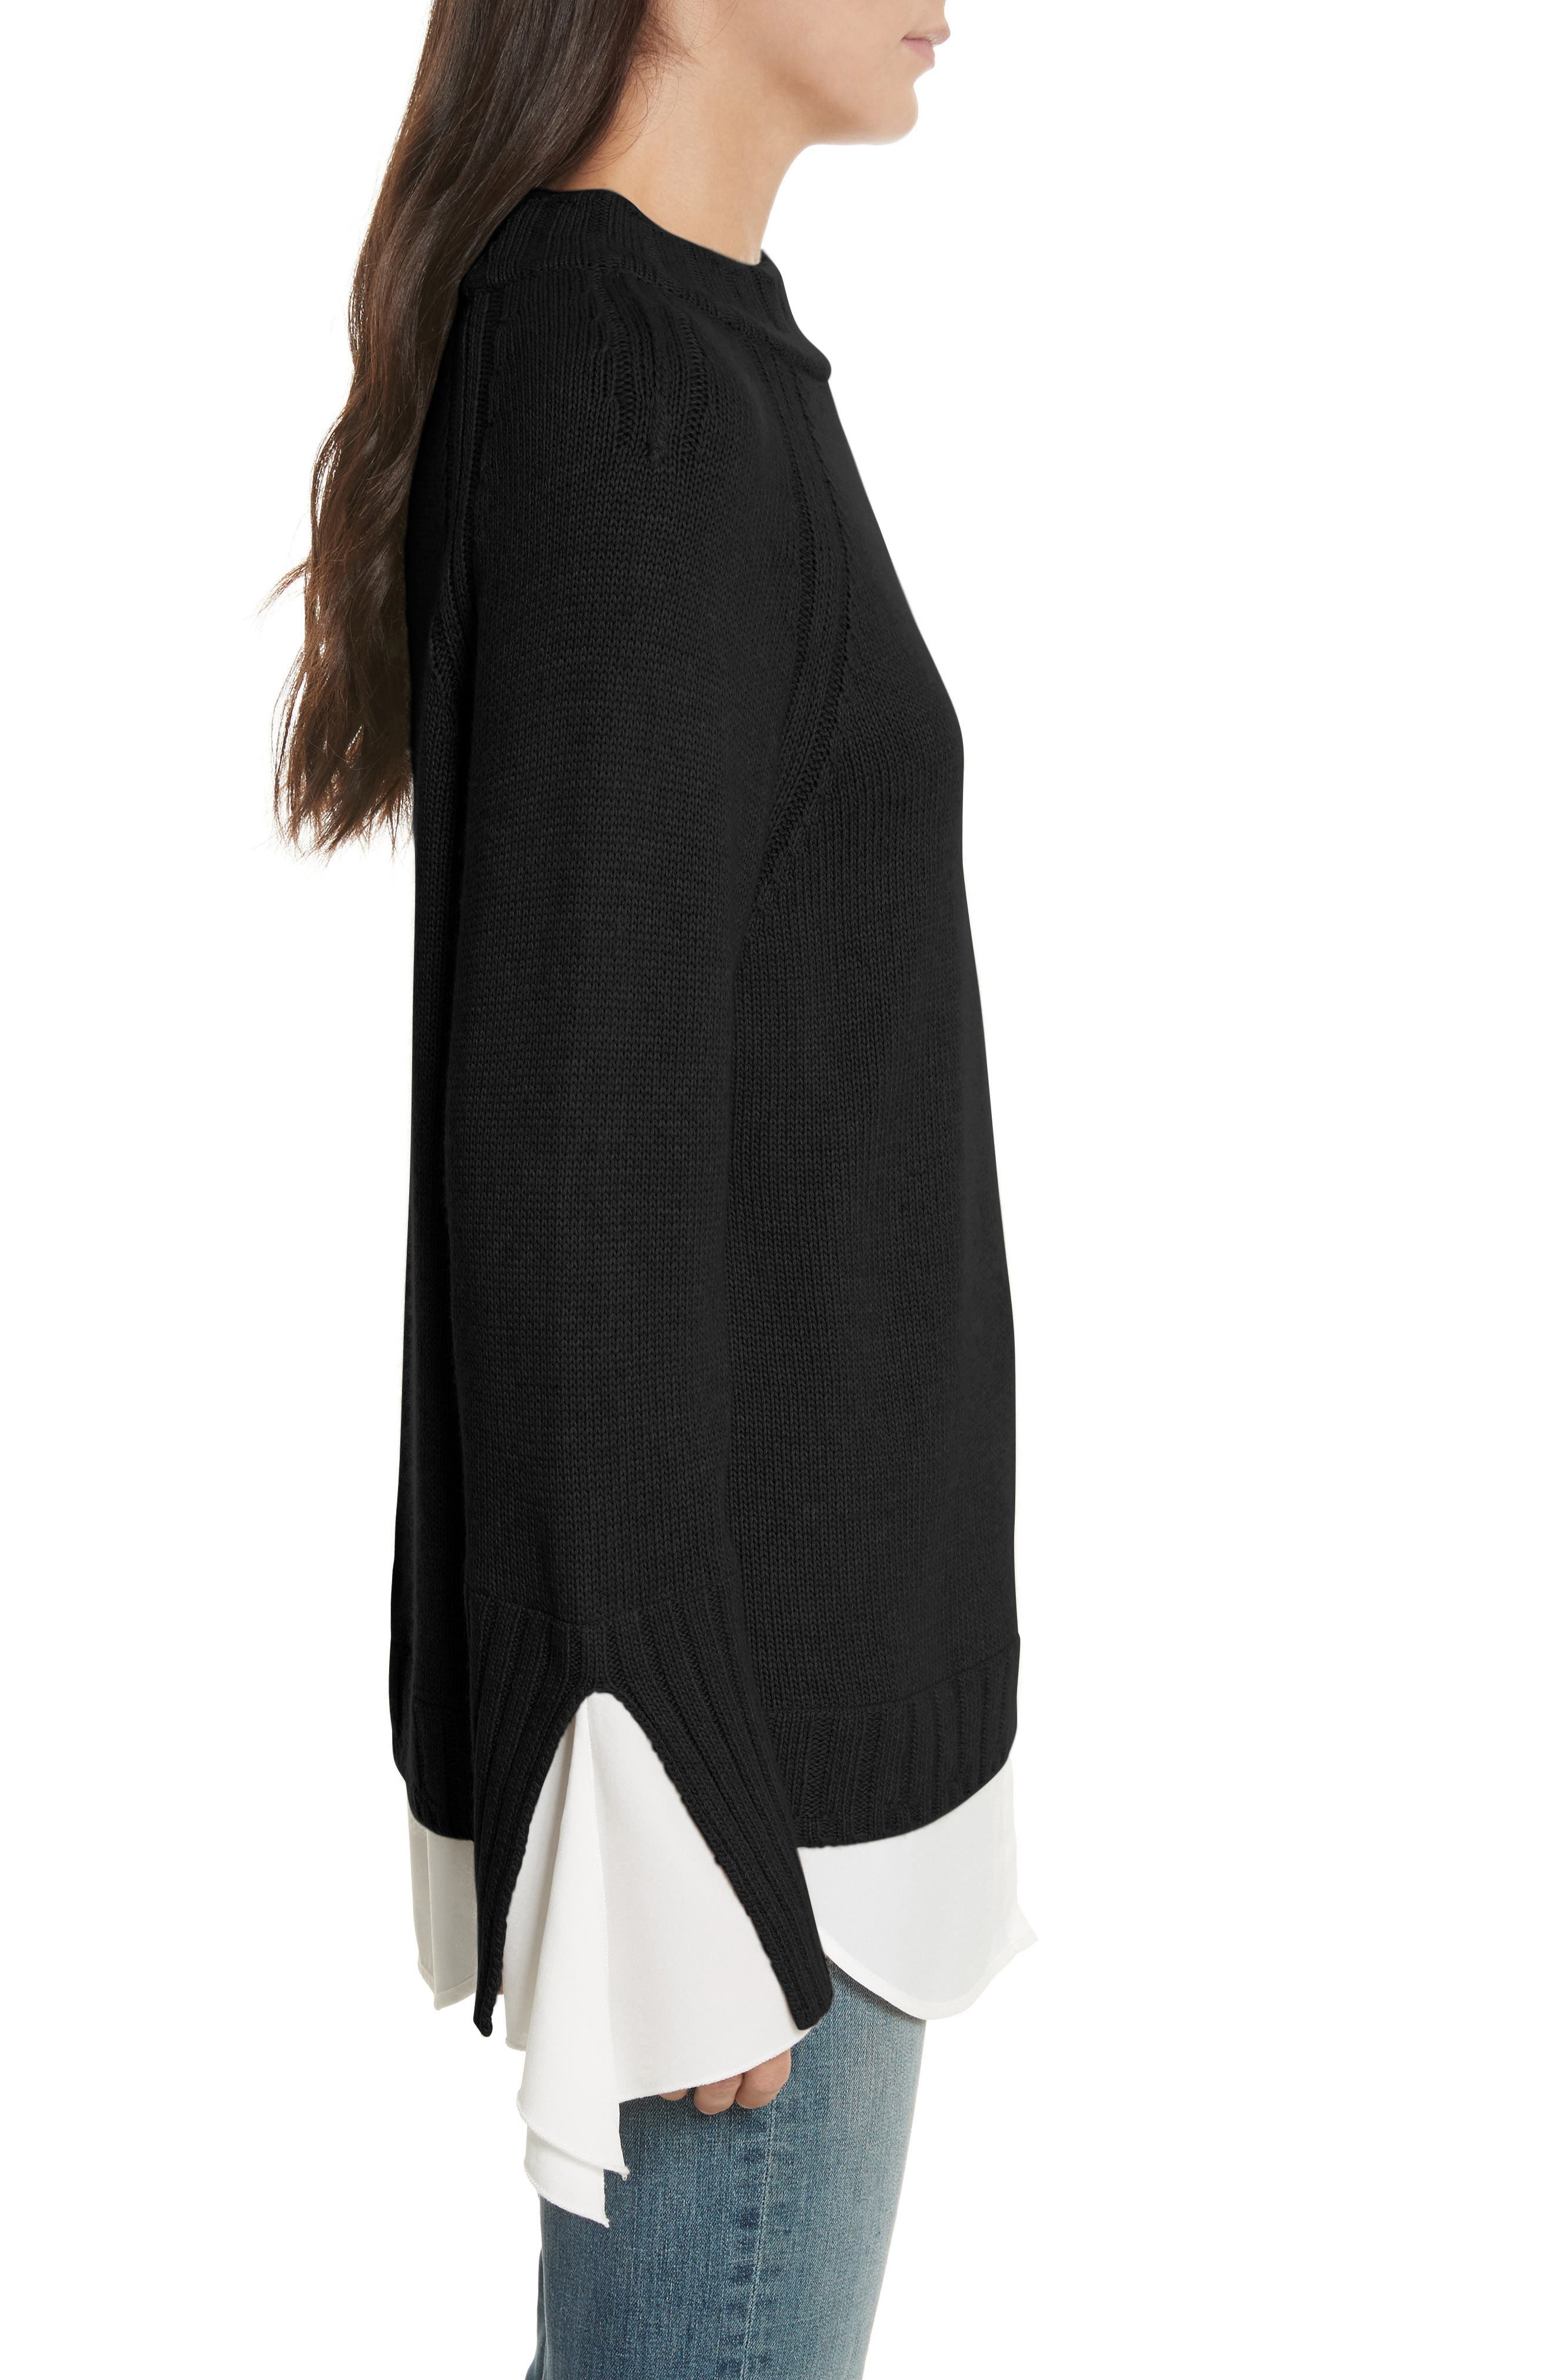 Remi Layered Pullover,                             Alternate thumbnail 3, color,                             Black/ White